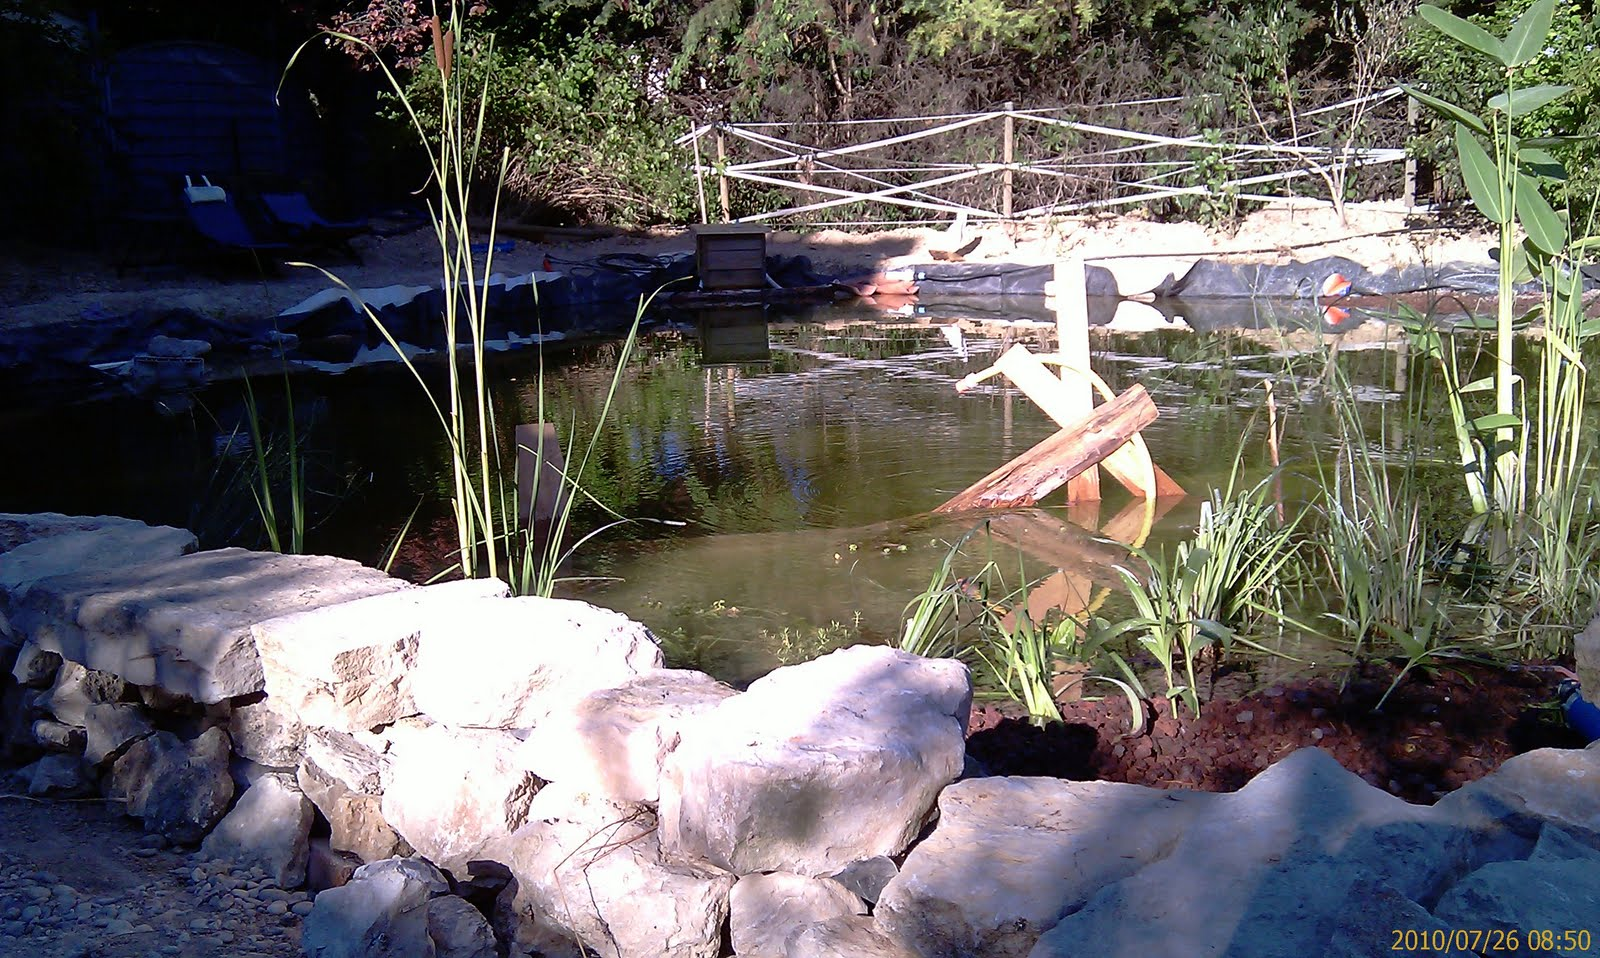 Bassin De Baignade Autoconstruction la piscine naturelle - autoconstruction - construire sa